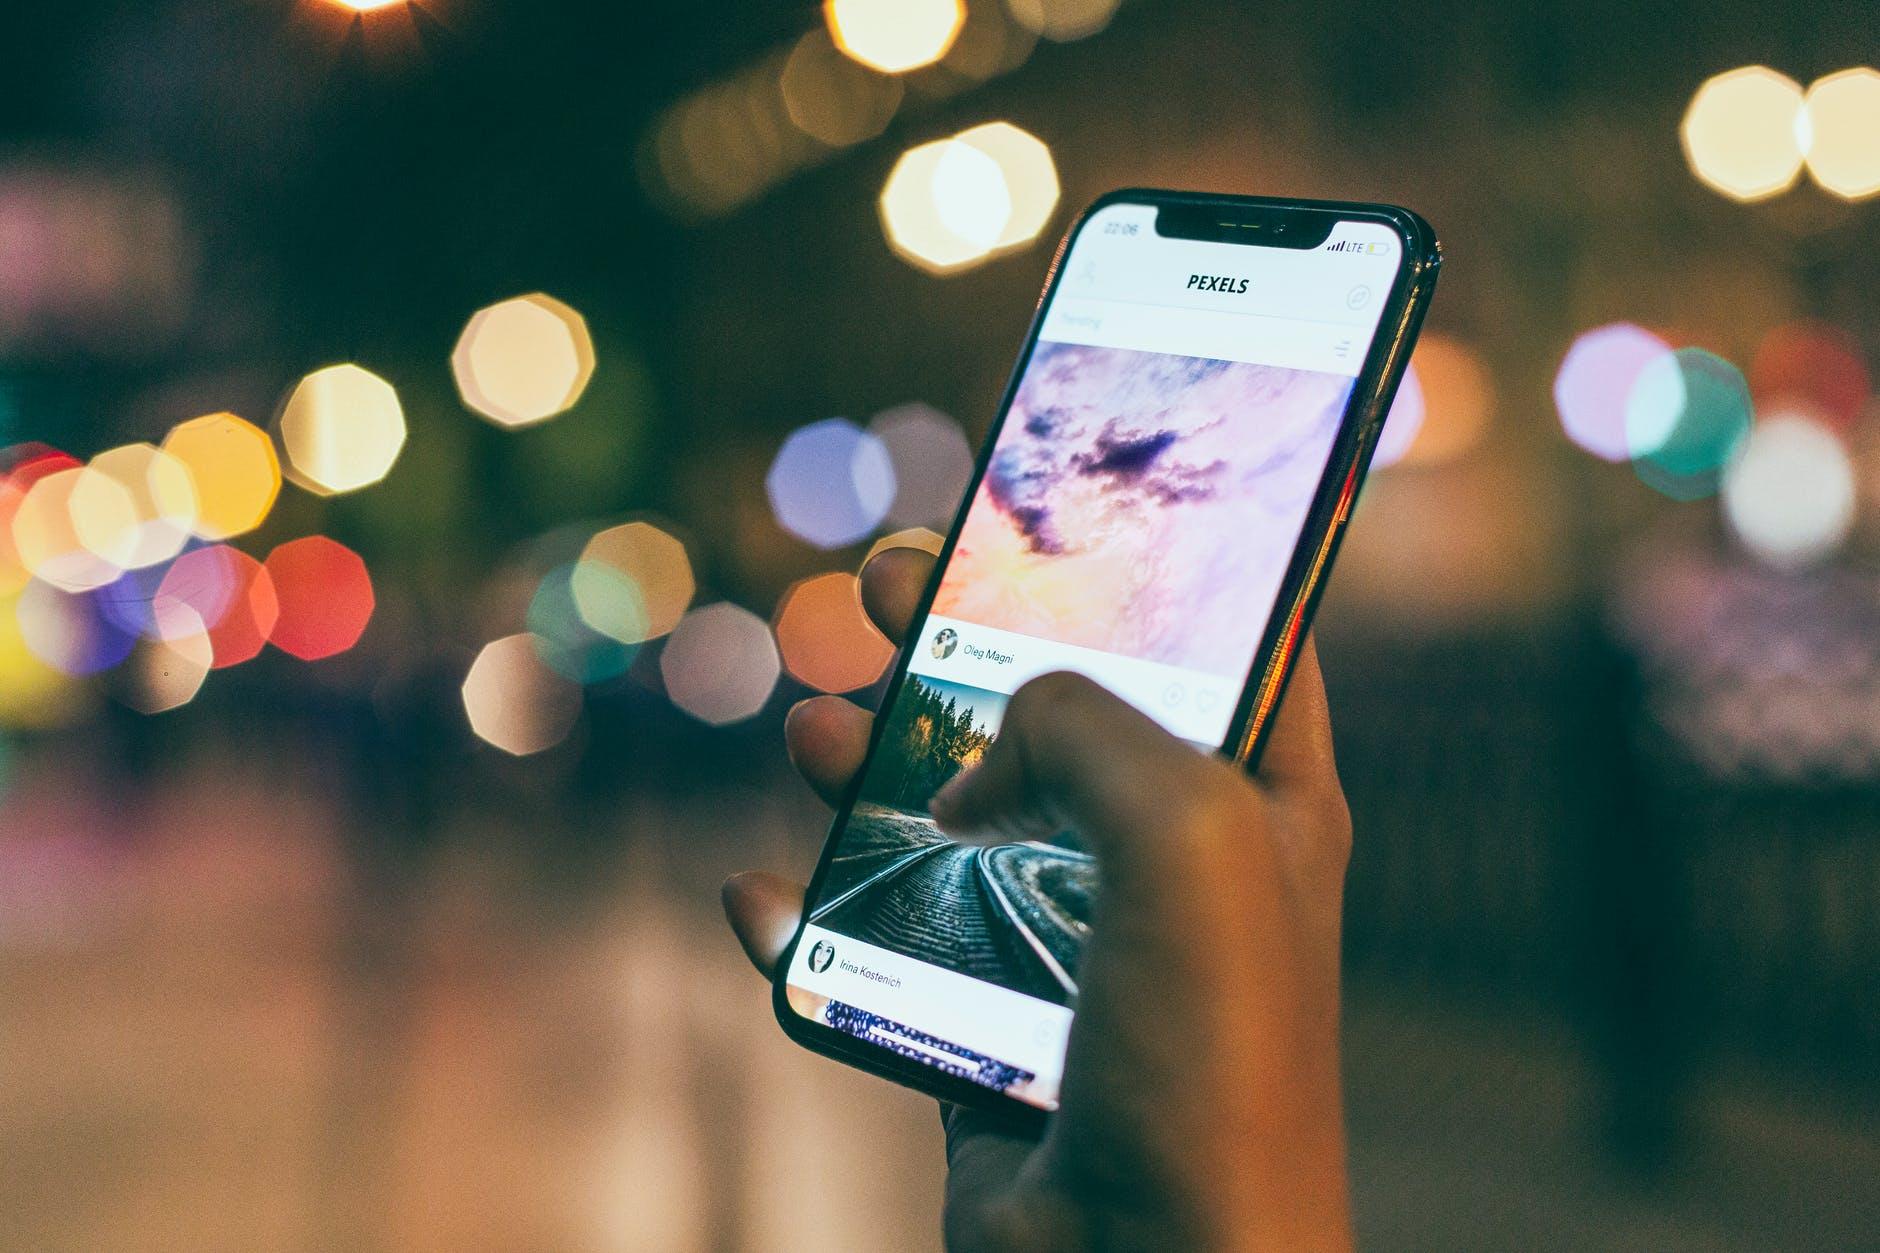 «МегаФон» дарит год интернета при покупке любого iPhone — детали акции